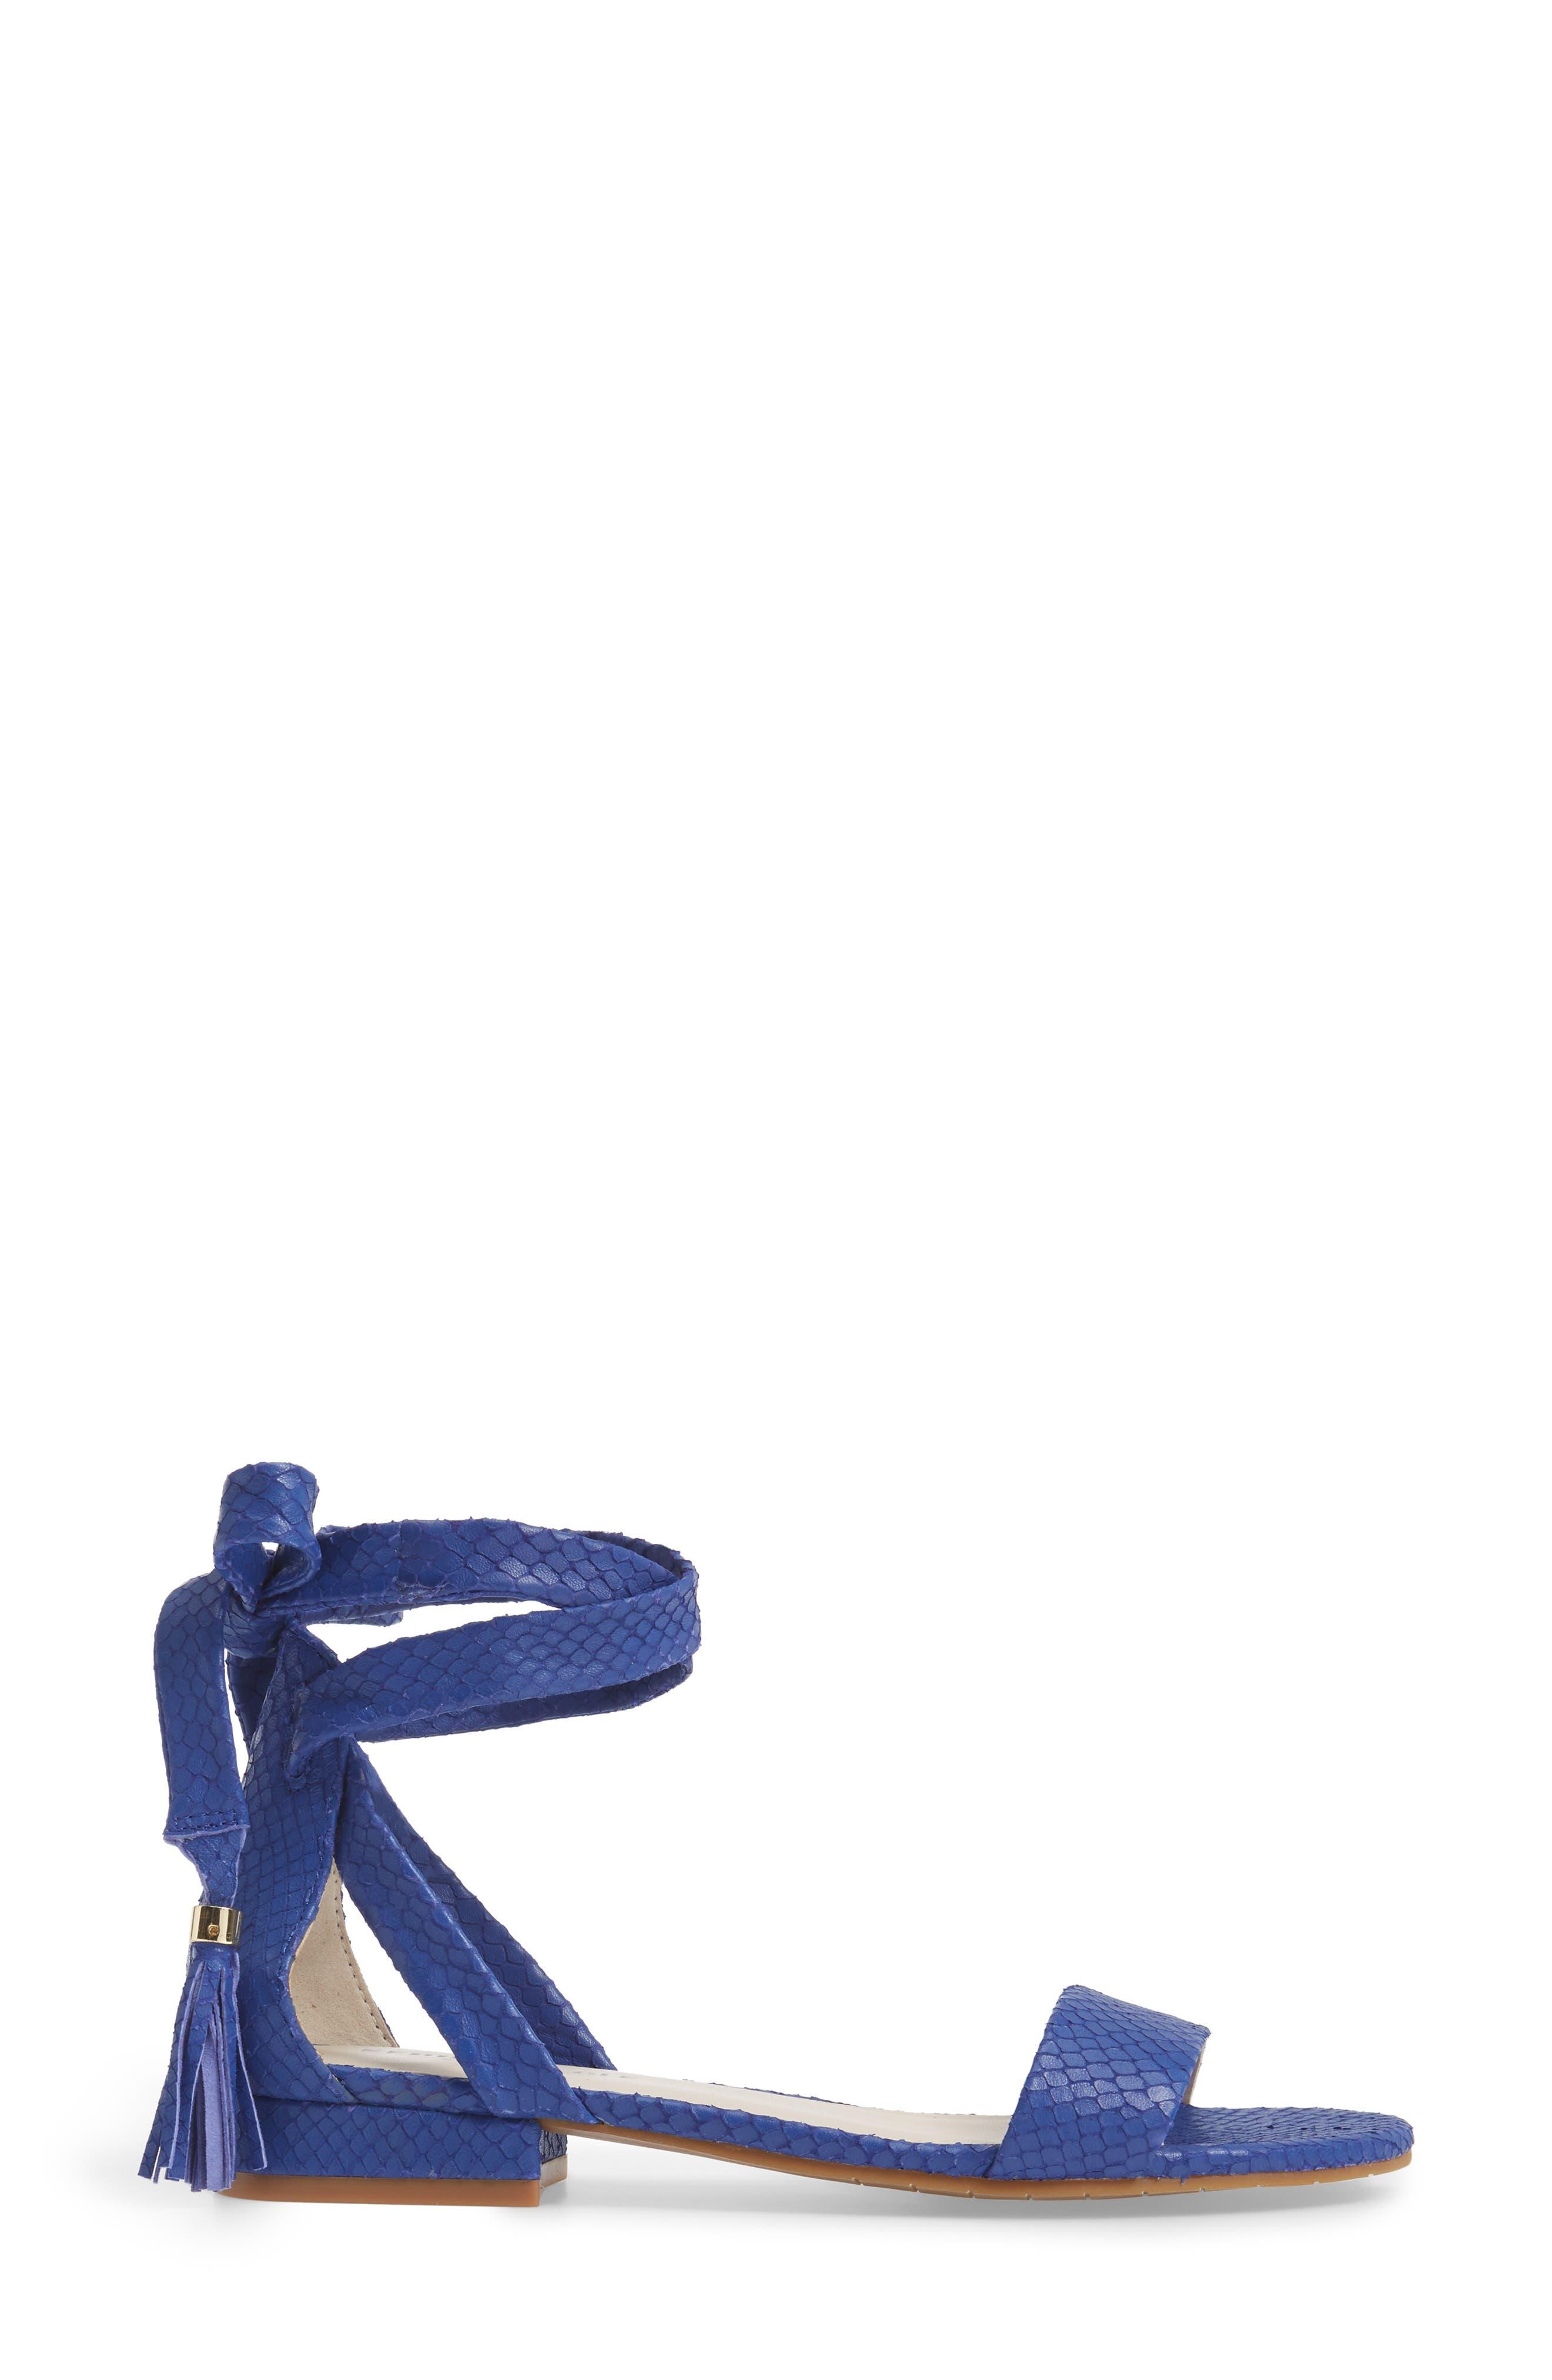 Valen Tassel Lace-Up Sandal,                             Alternate thumbnail 37, color,